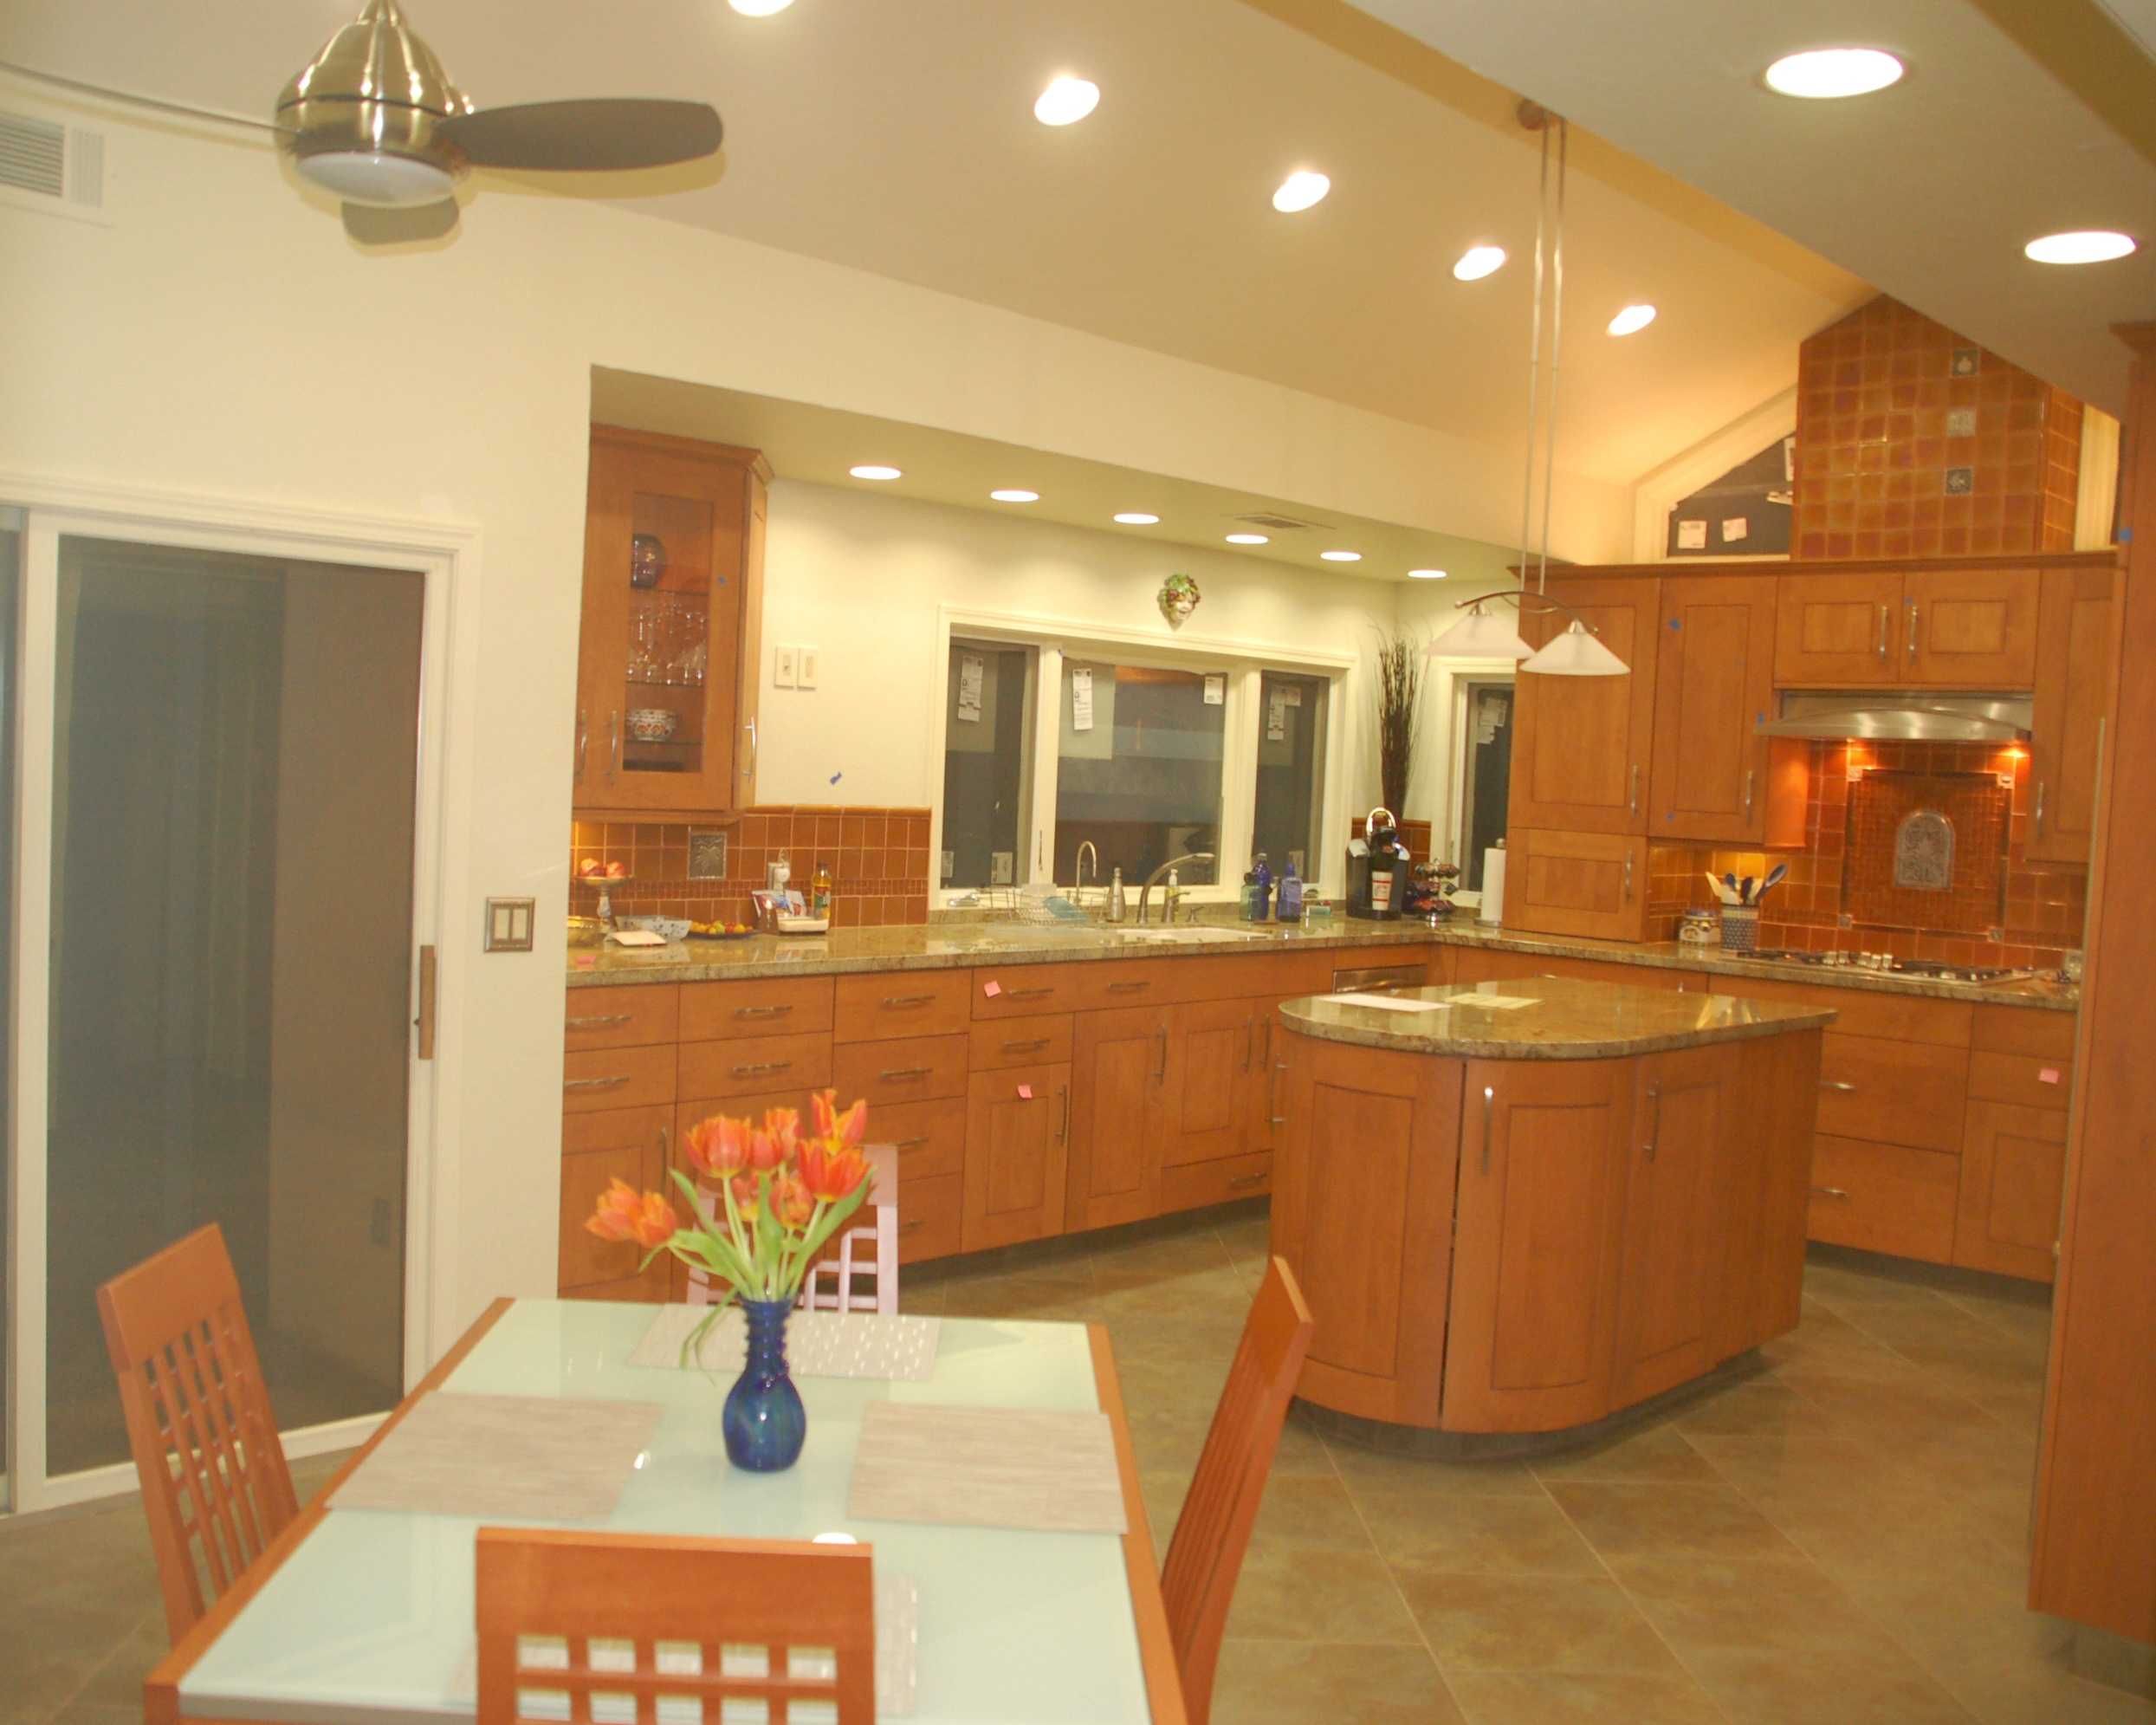 Kitchen and bath remodeling fresno ca besto blog - Kitchen and bath design schools ...